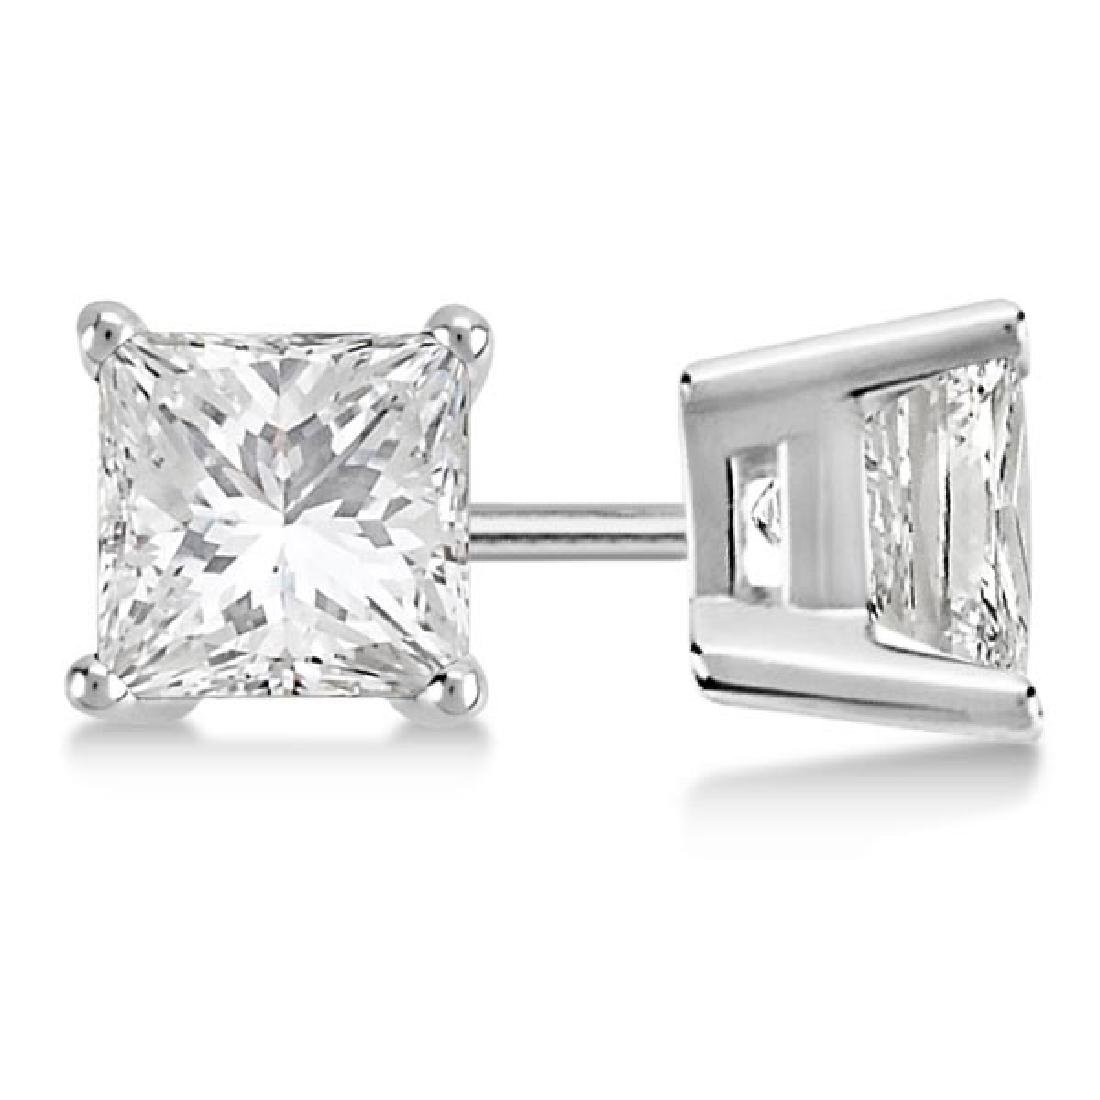 Certified 1.02 CTW Princess Diamond Stud Earrings D/SI3